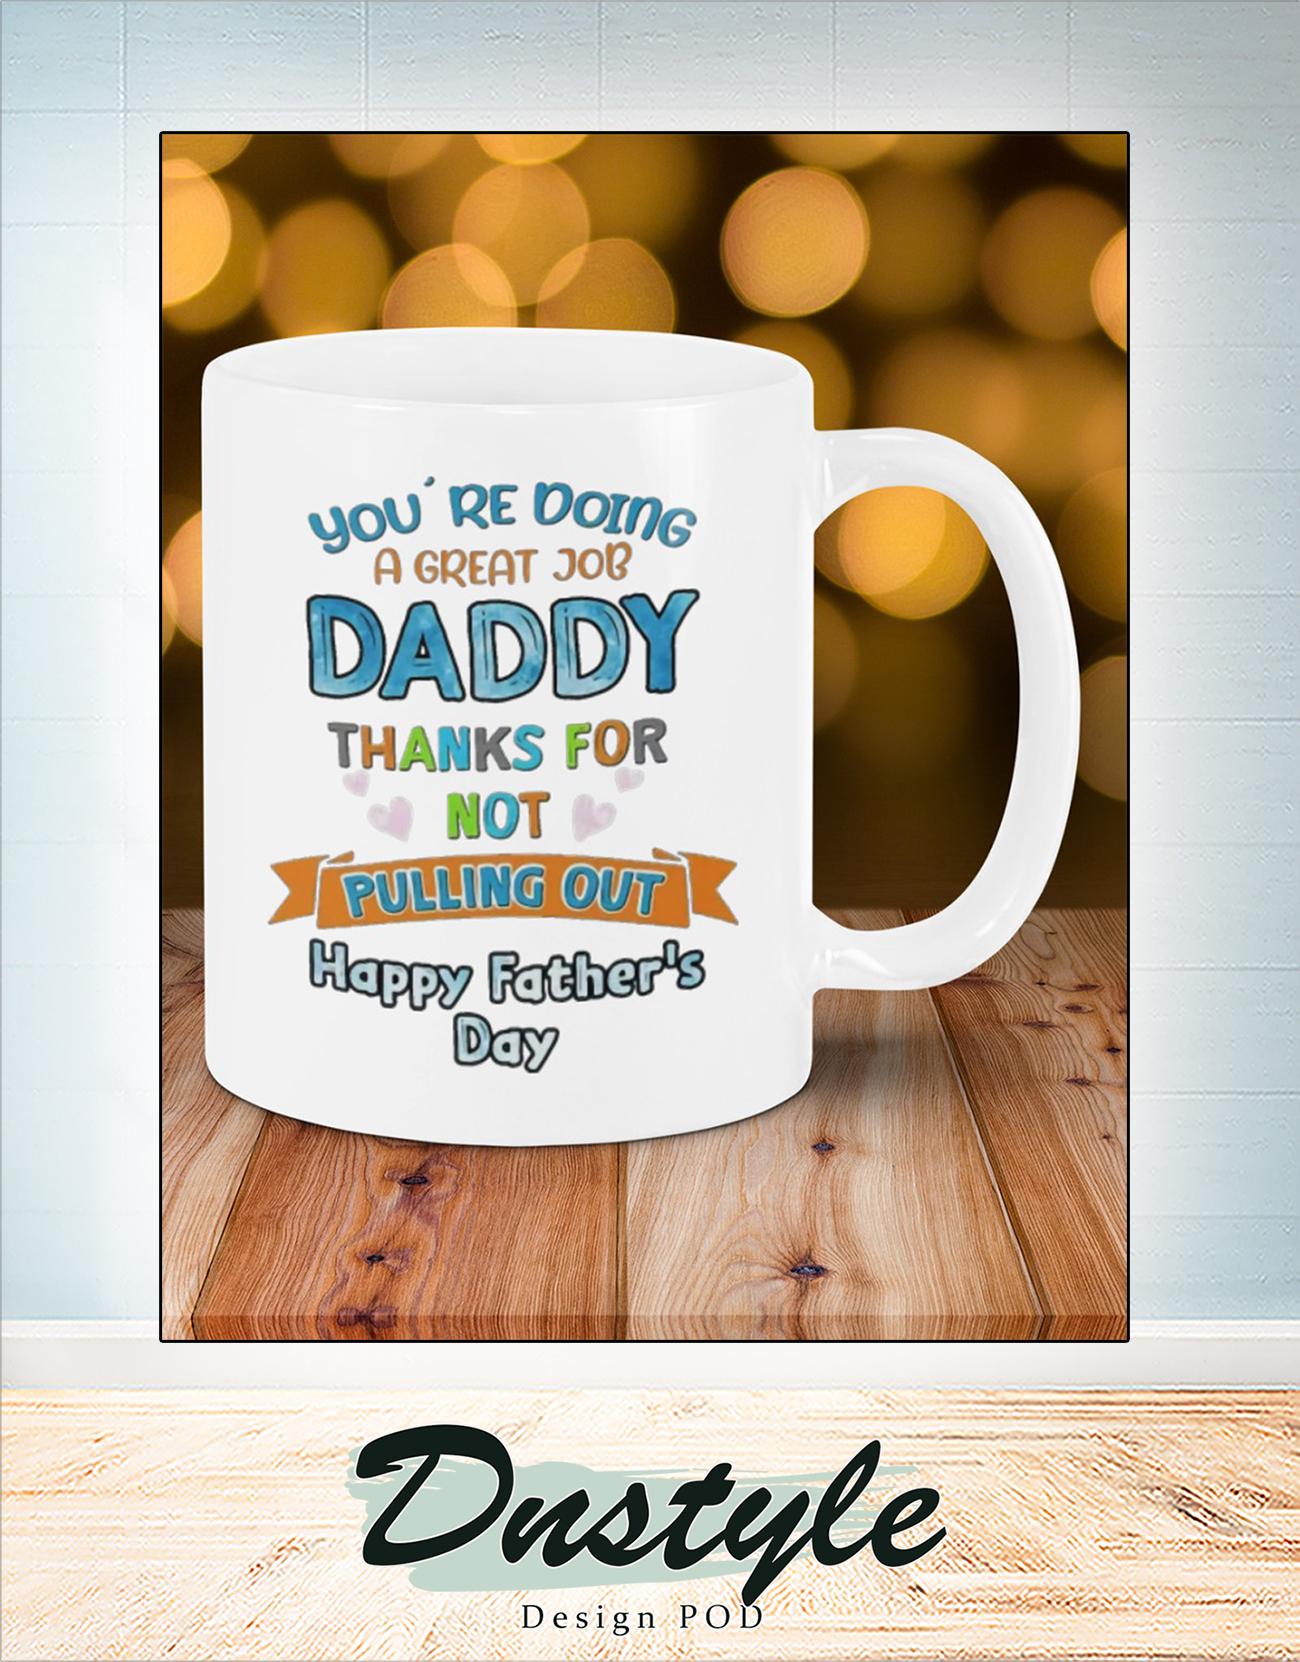 You're doing a great job daddy mug 2